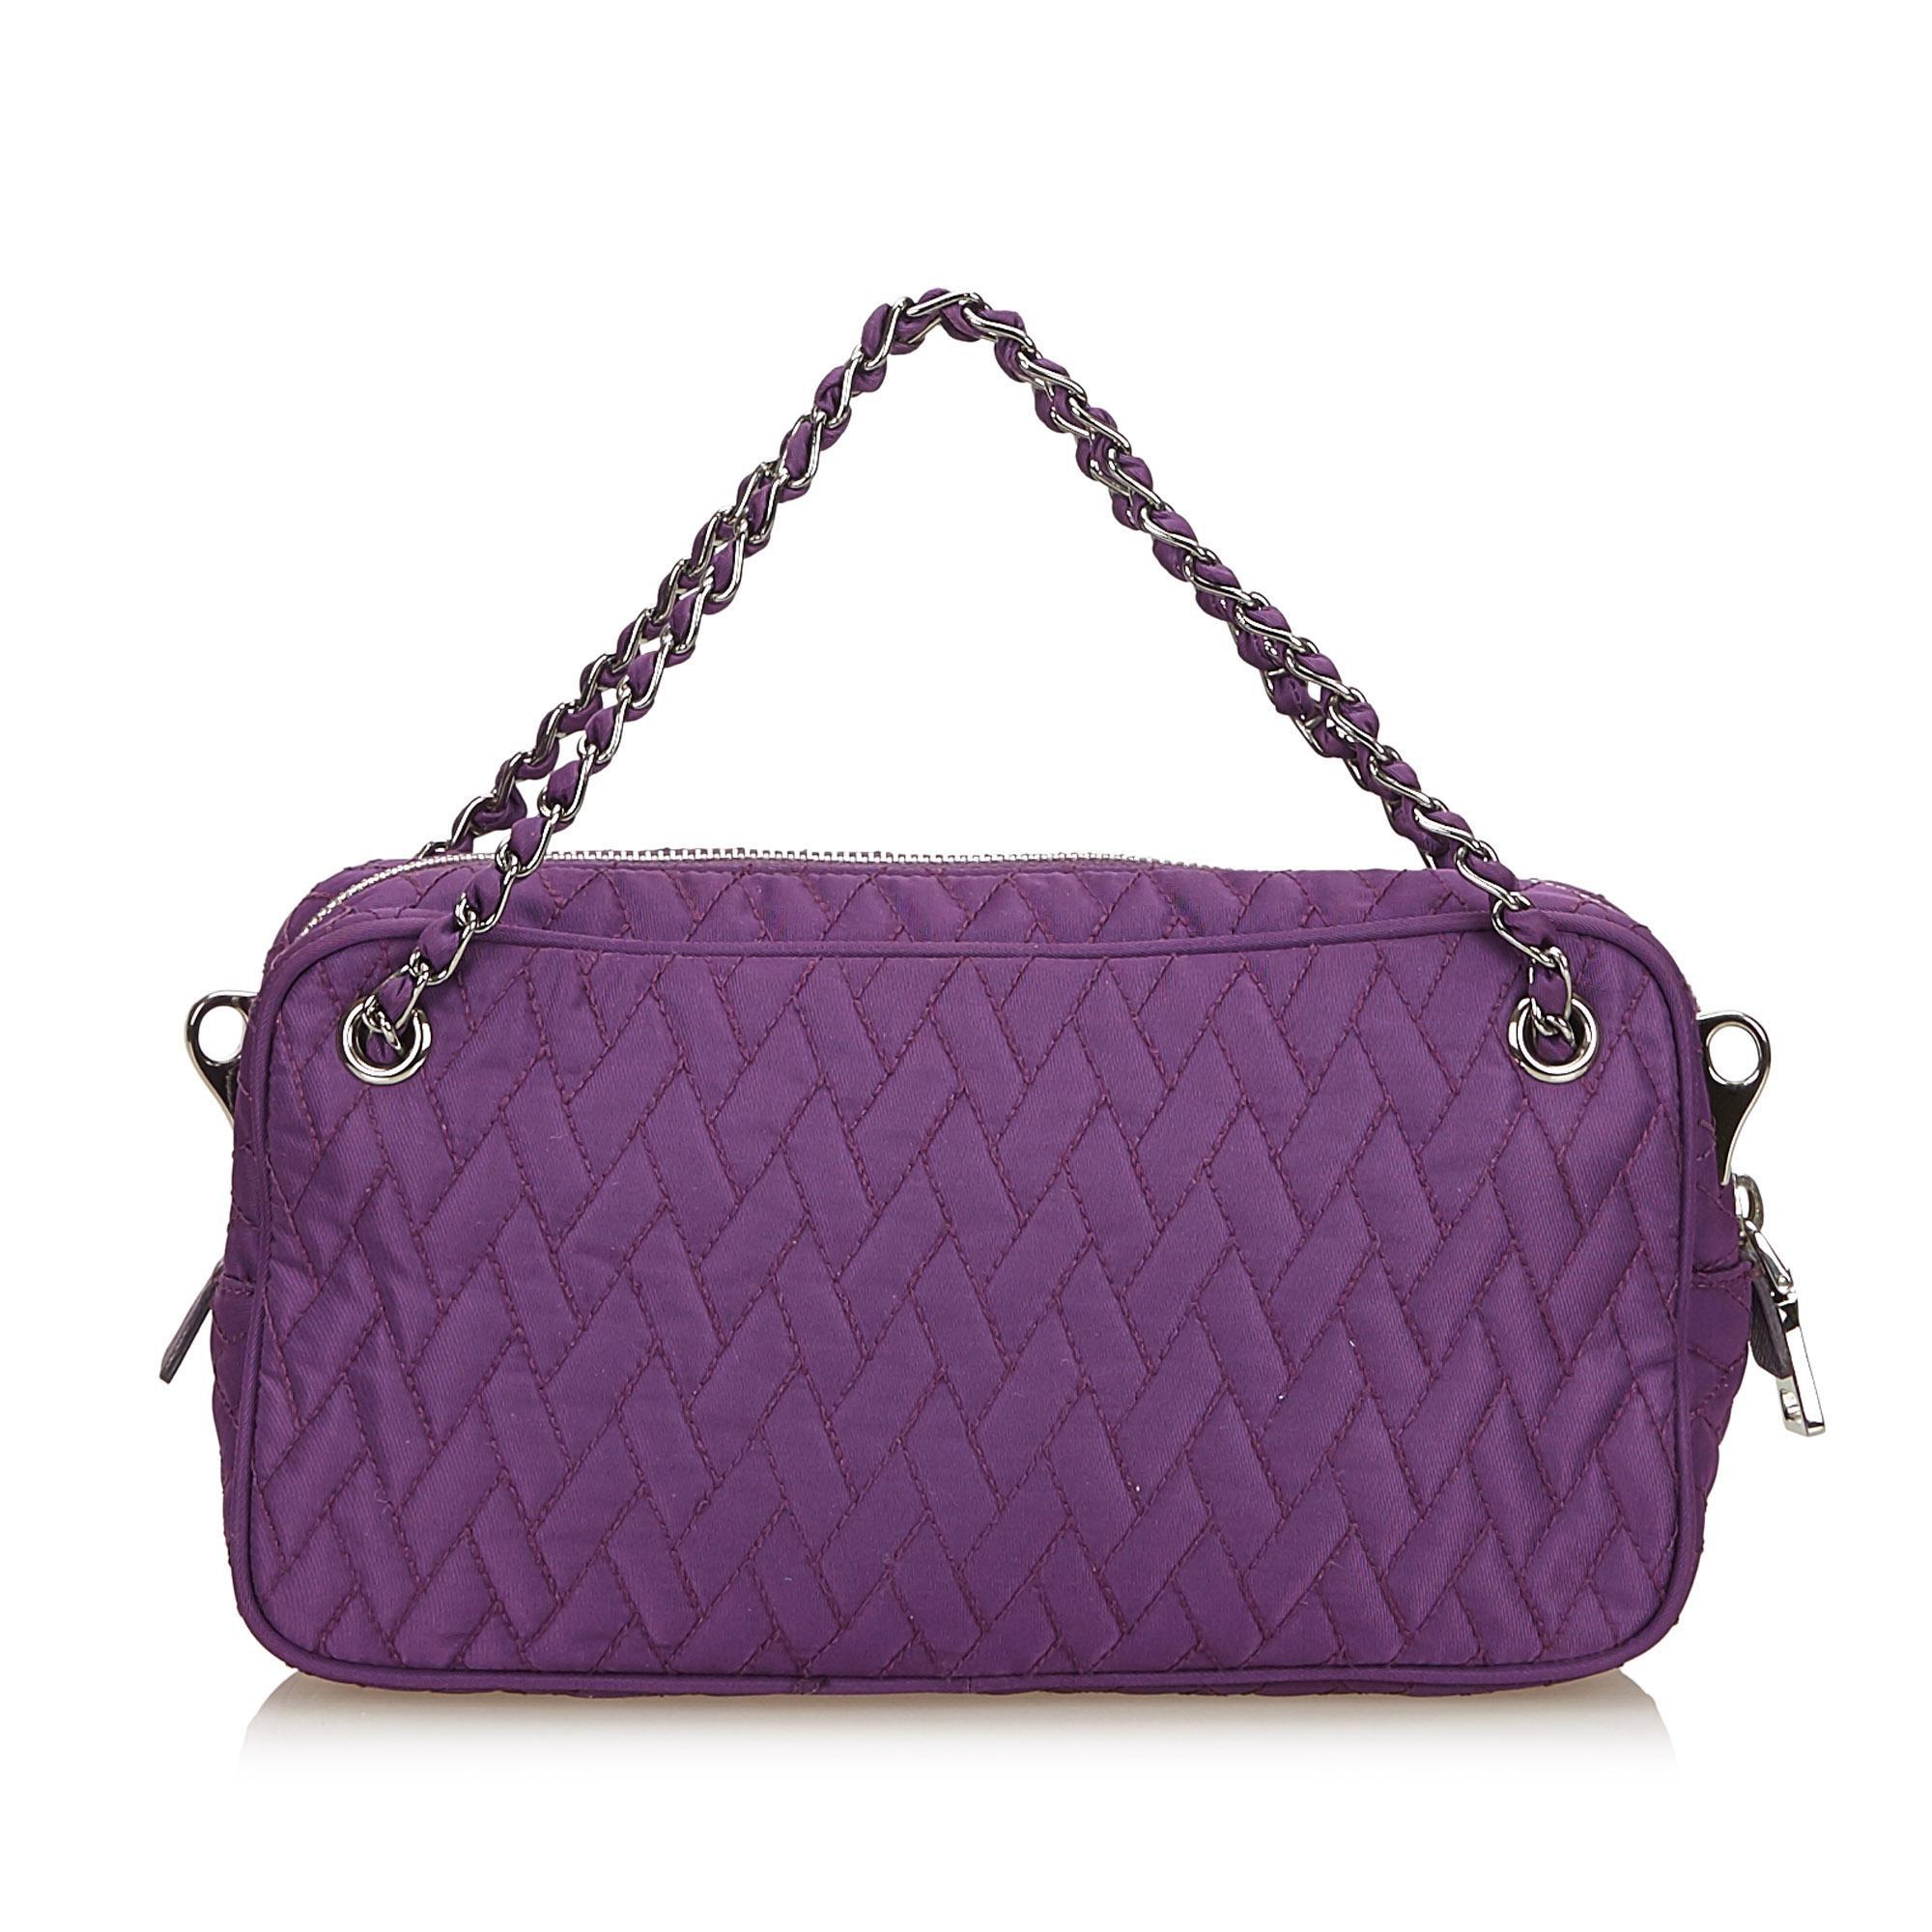 4f59bcdc601b Prada Purple Quilted Nylon Chain Satchel